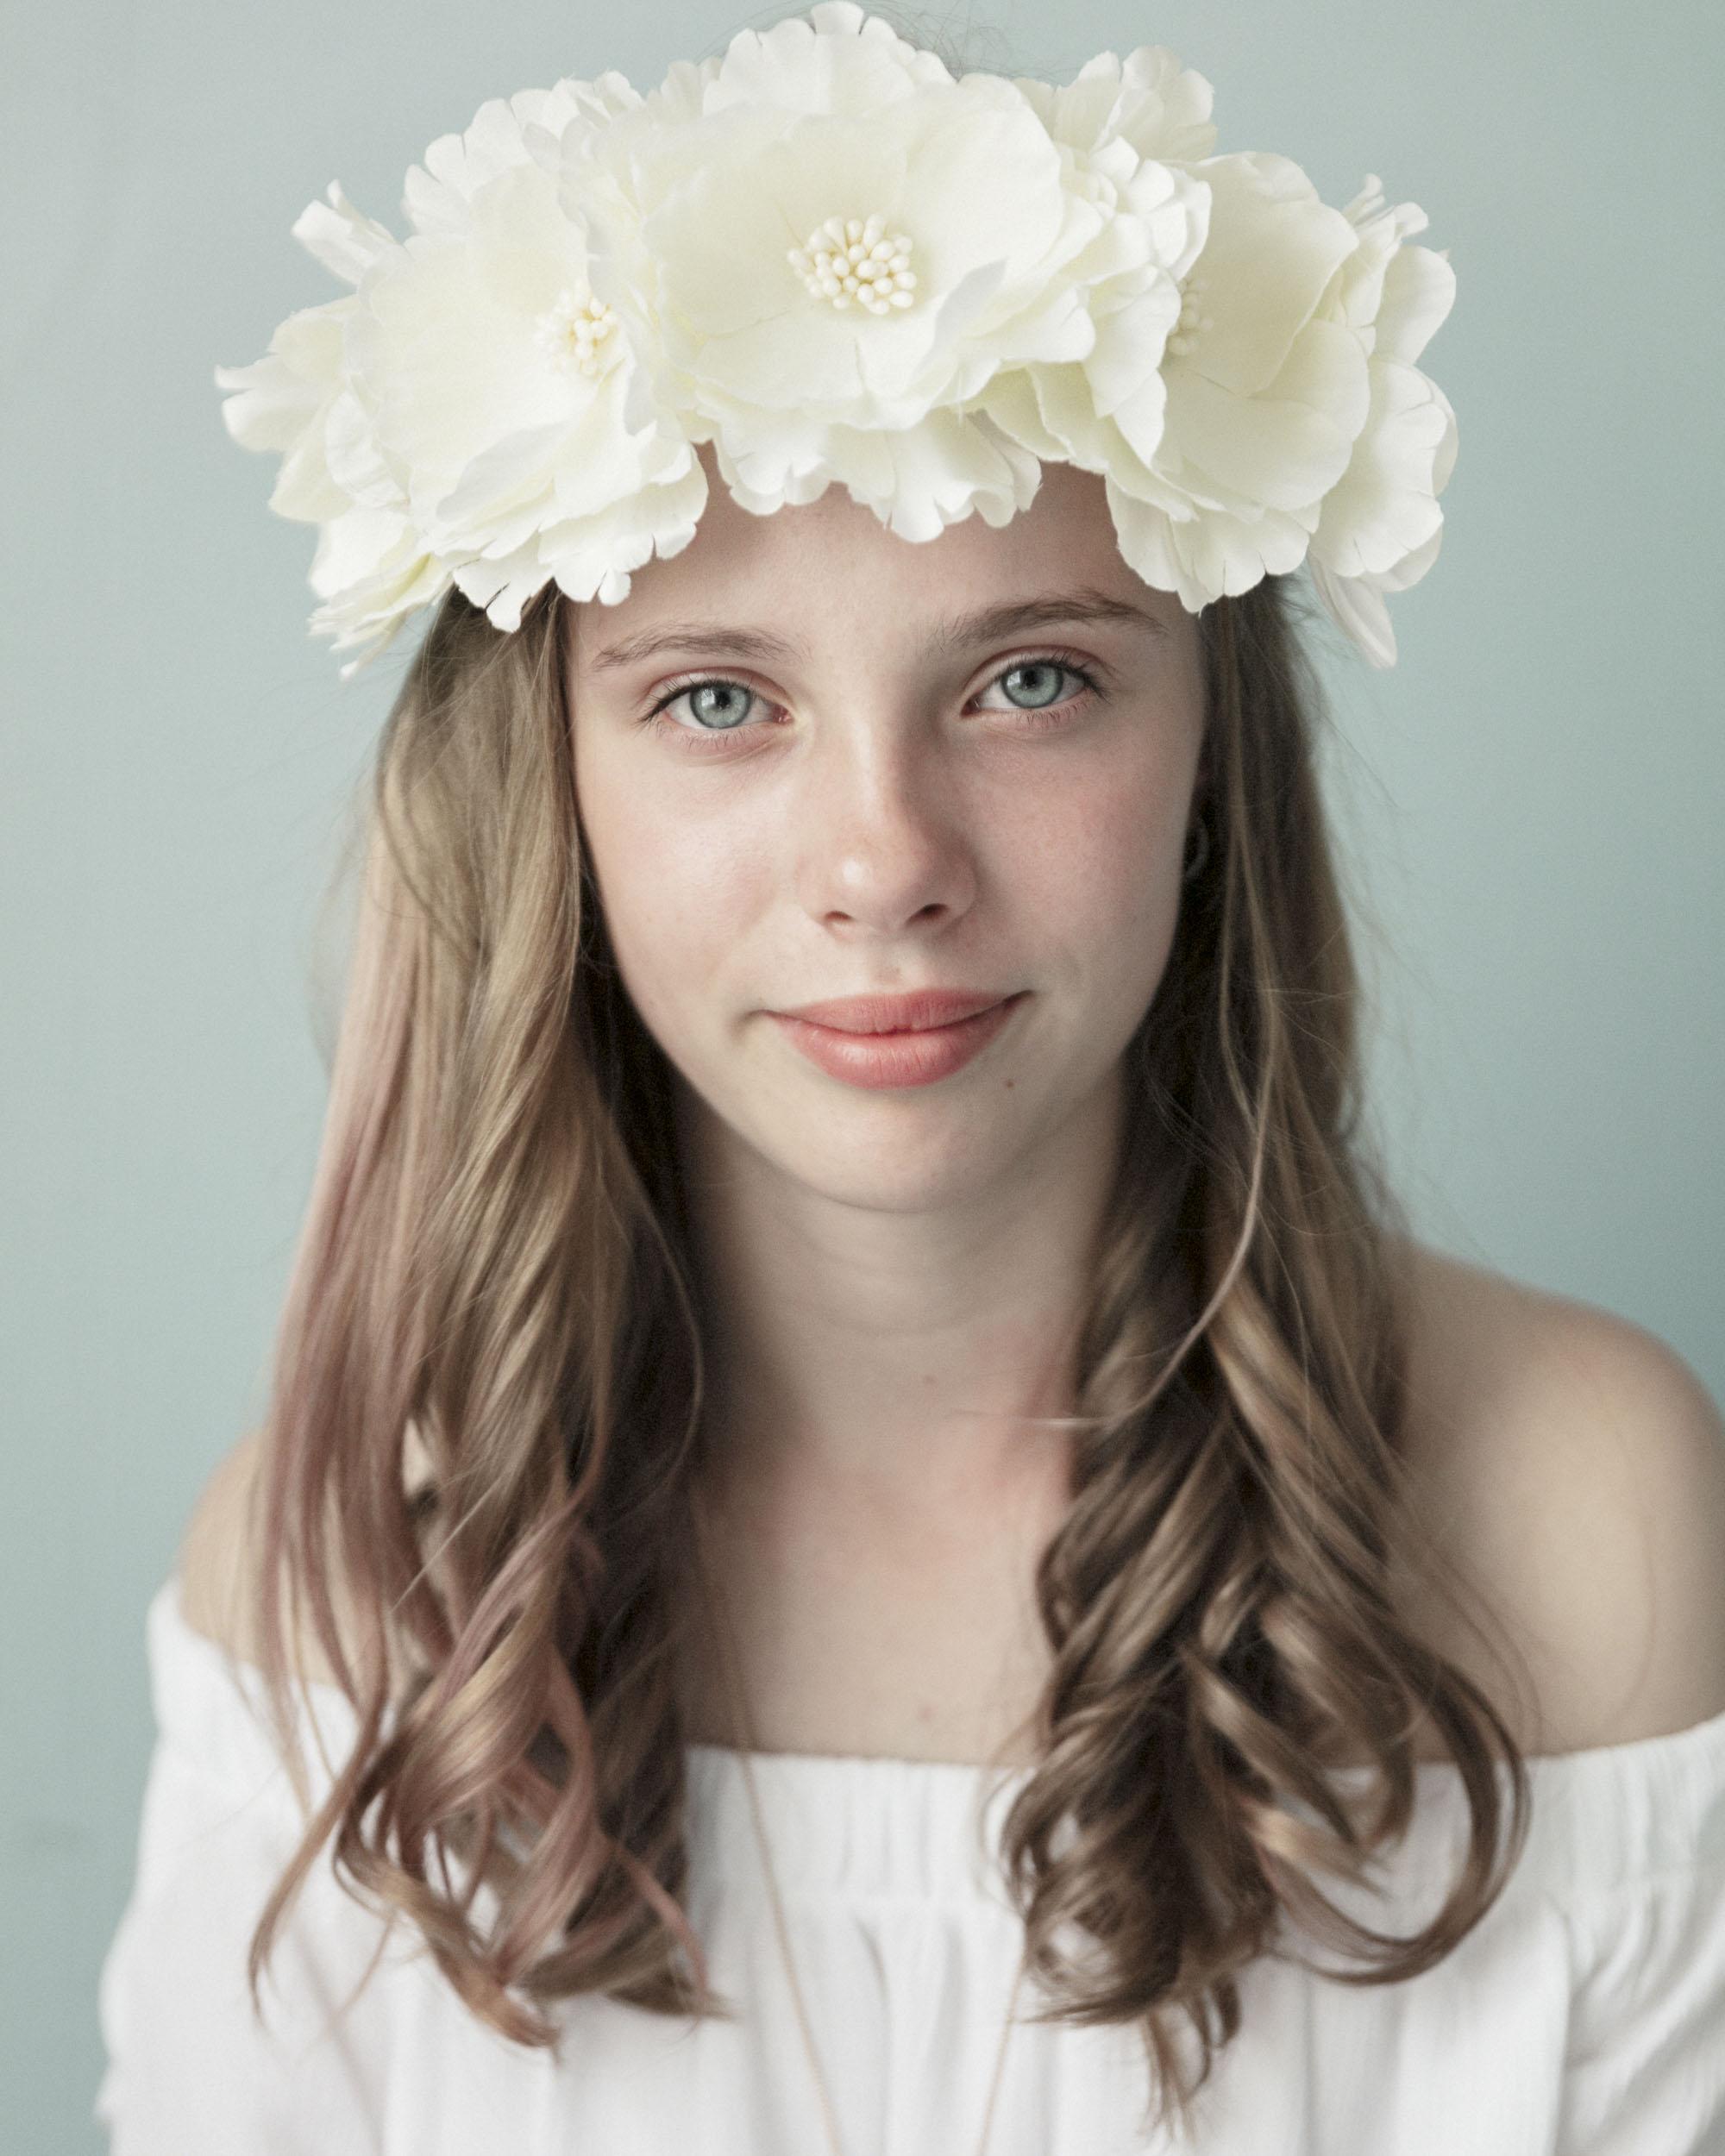 marina-mcdonald-teen-portrait-photography-portfolio-canberra-teen-girl-white-flowers-child